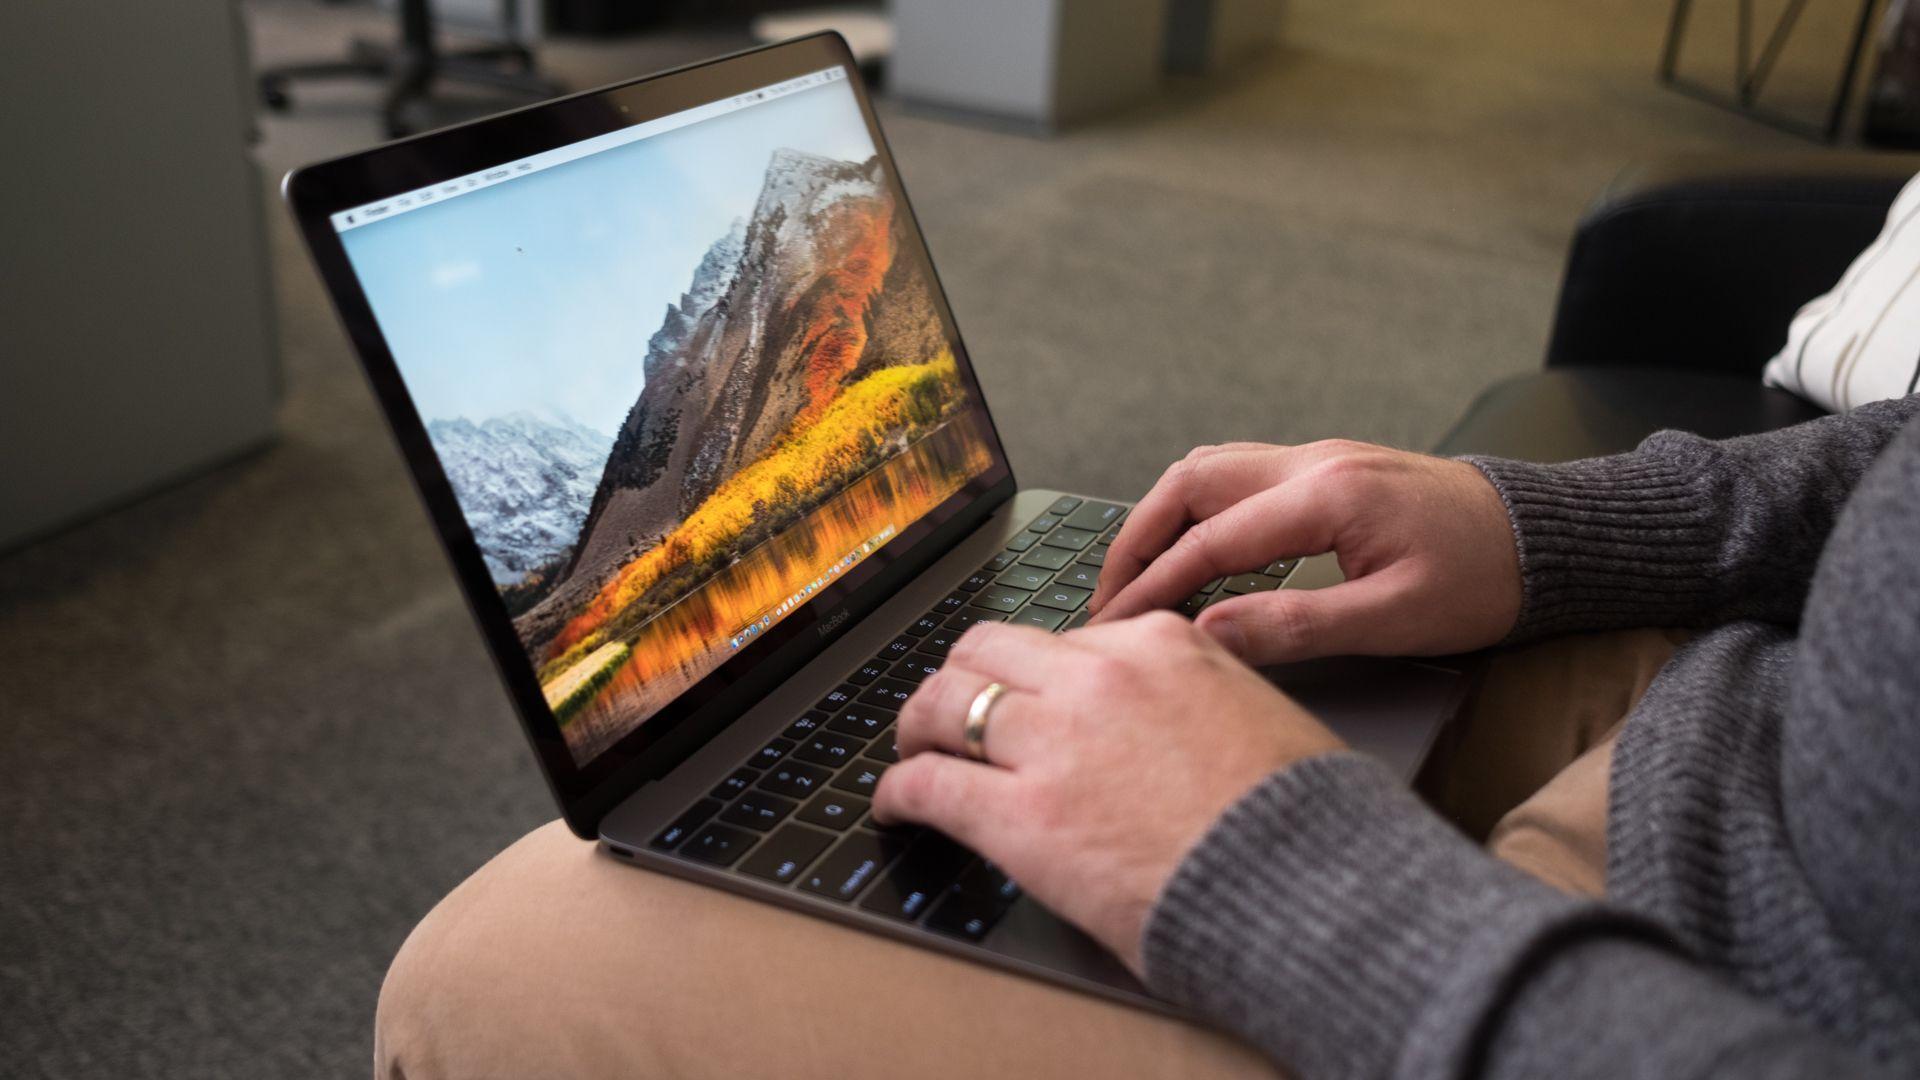 MacBook 2019 release date, news and rumors